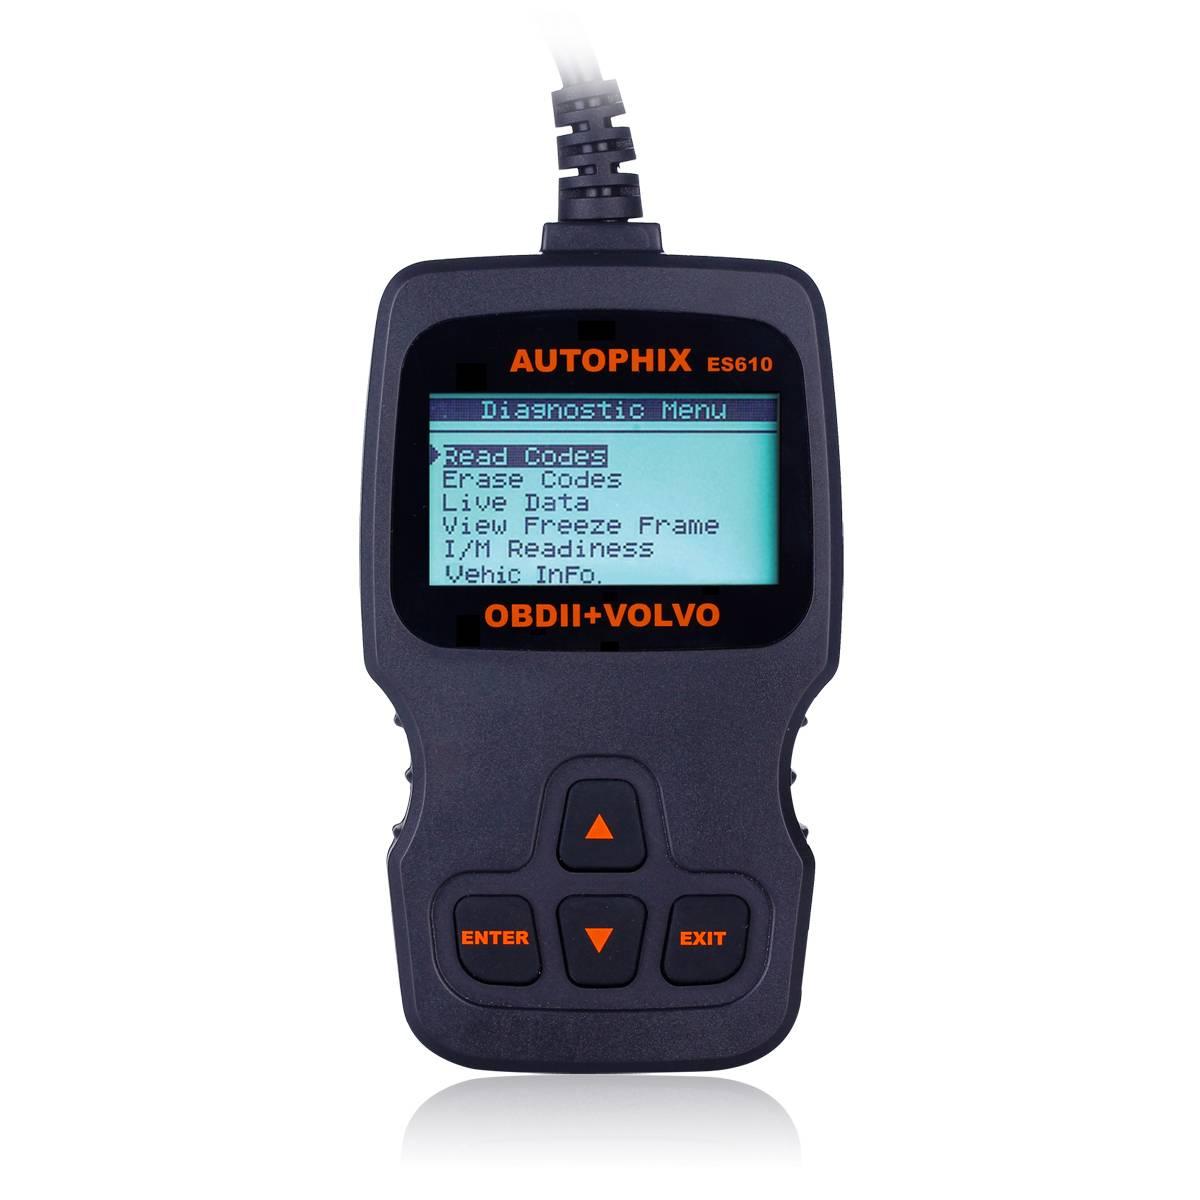 Autophix ES610 ABS SRS Airbag Transmission Volvo Diagnostic Scan Tool OBD2 EOBD Code Reader